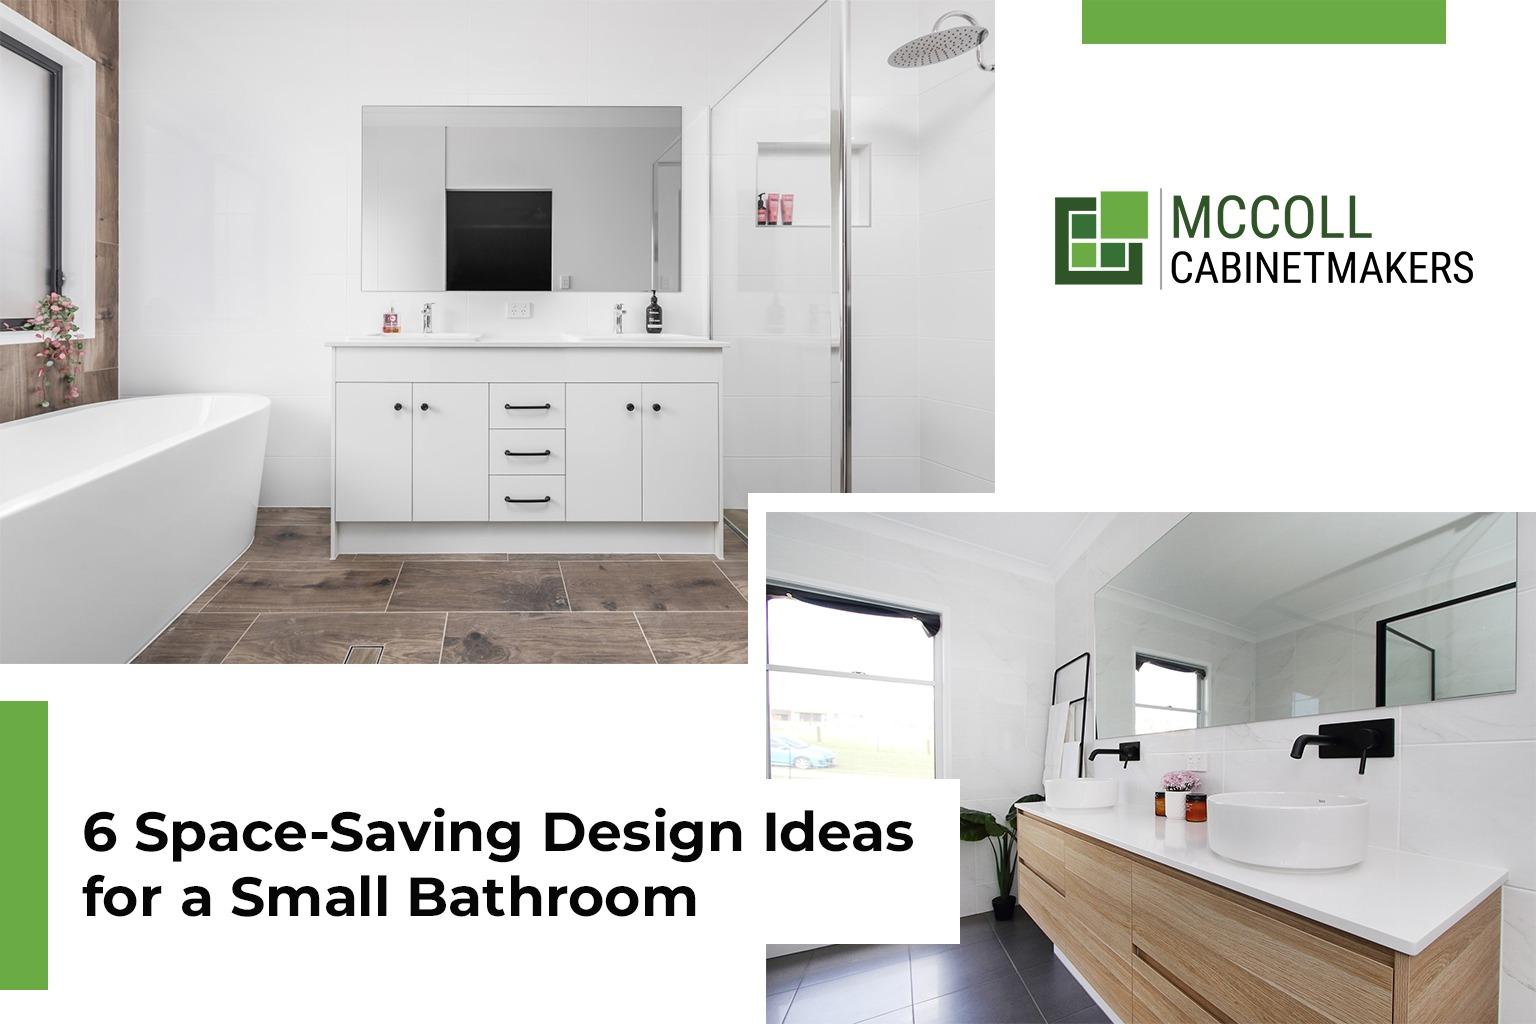 6 Space-Saving Design Ideas for Small Bathrooms